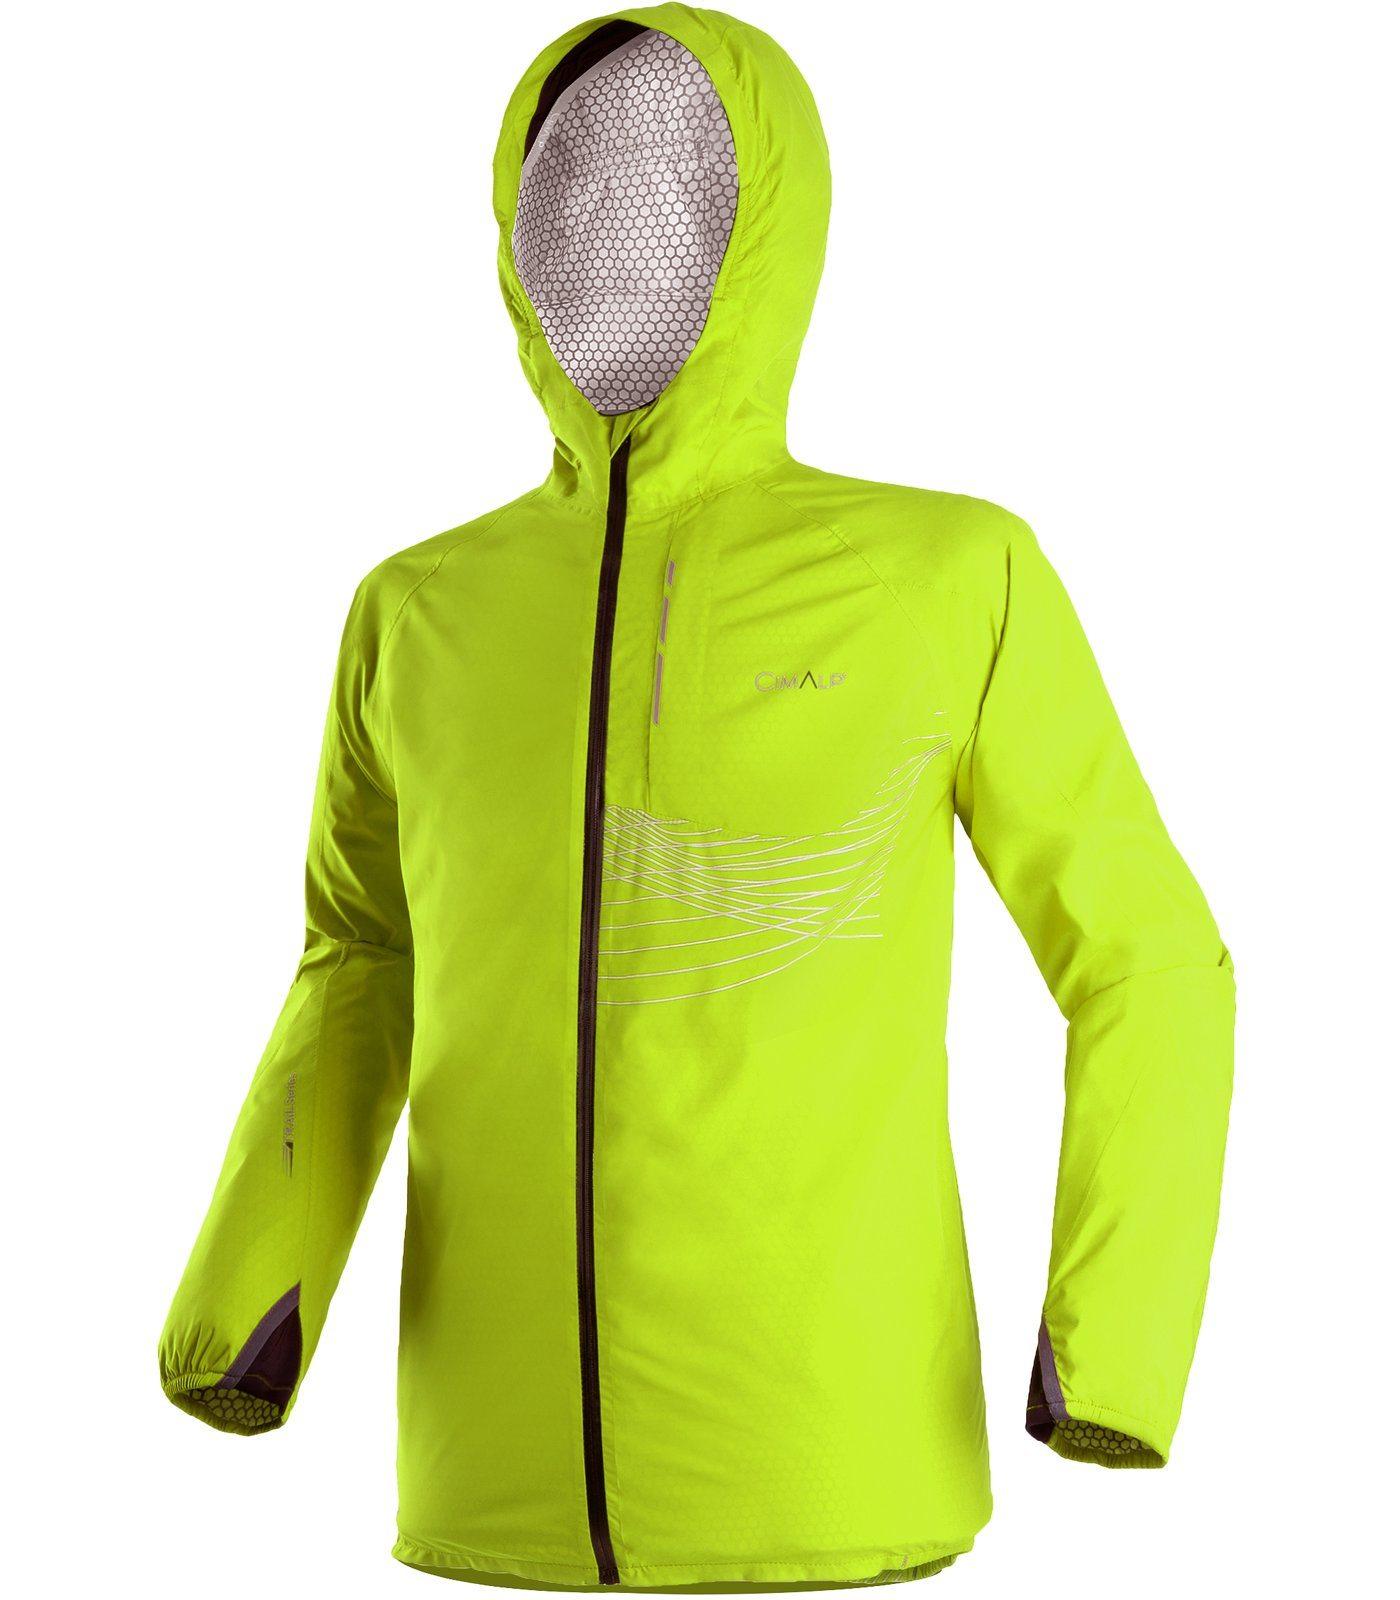 choisir sa veste de trail